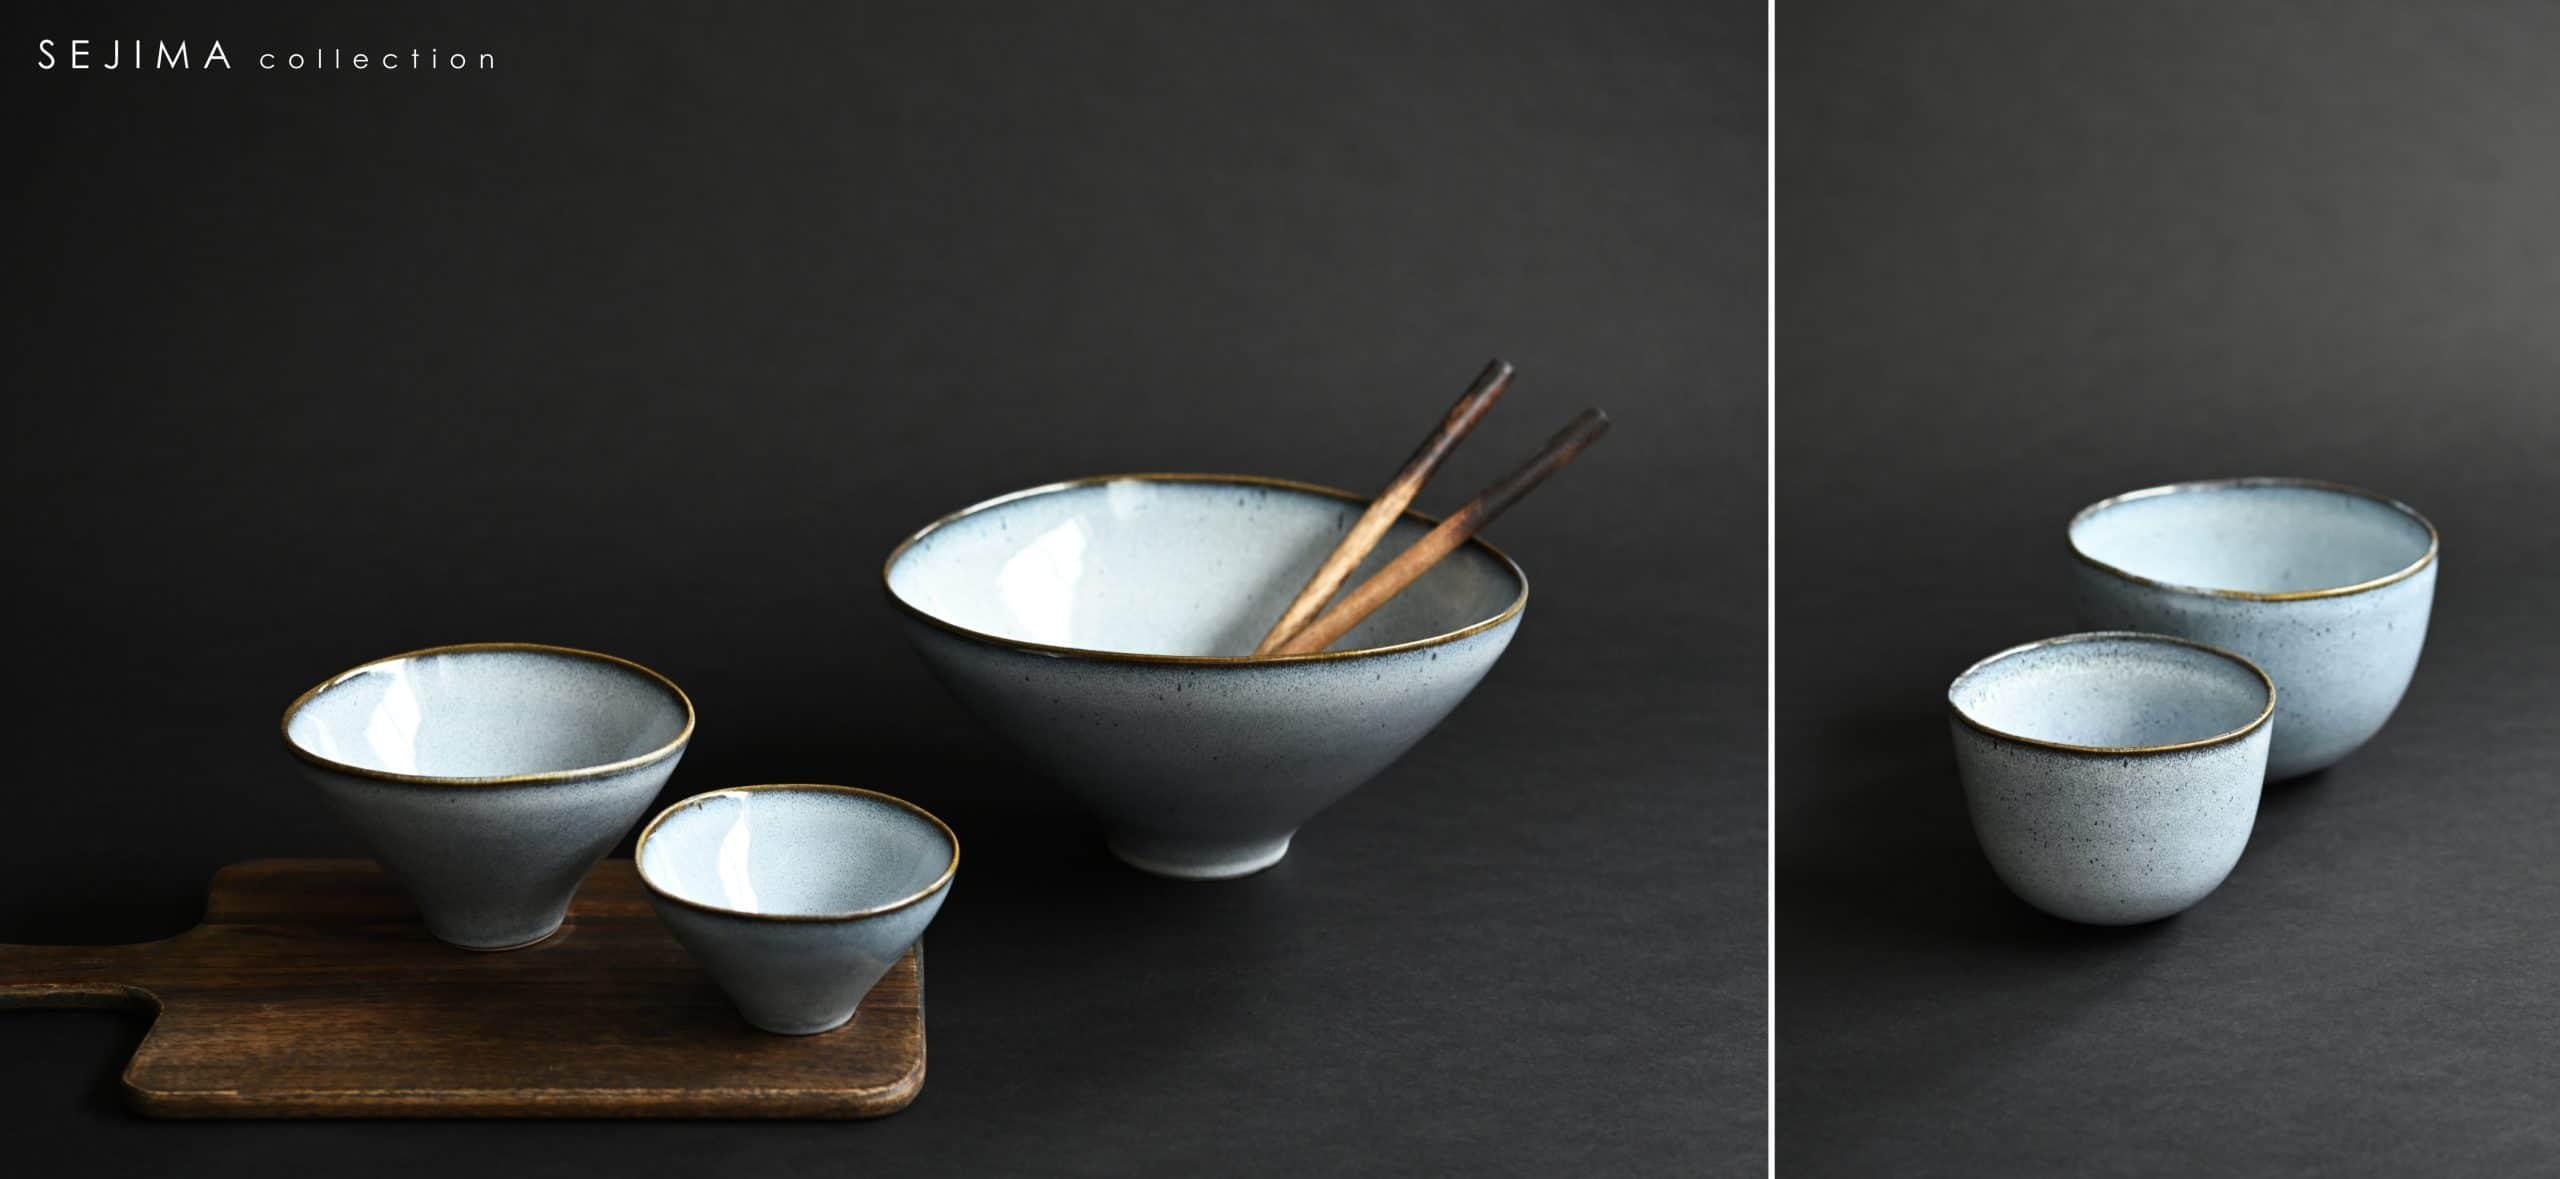 valdosol-stoneware-sejima